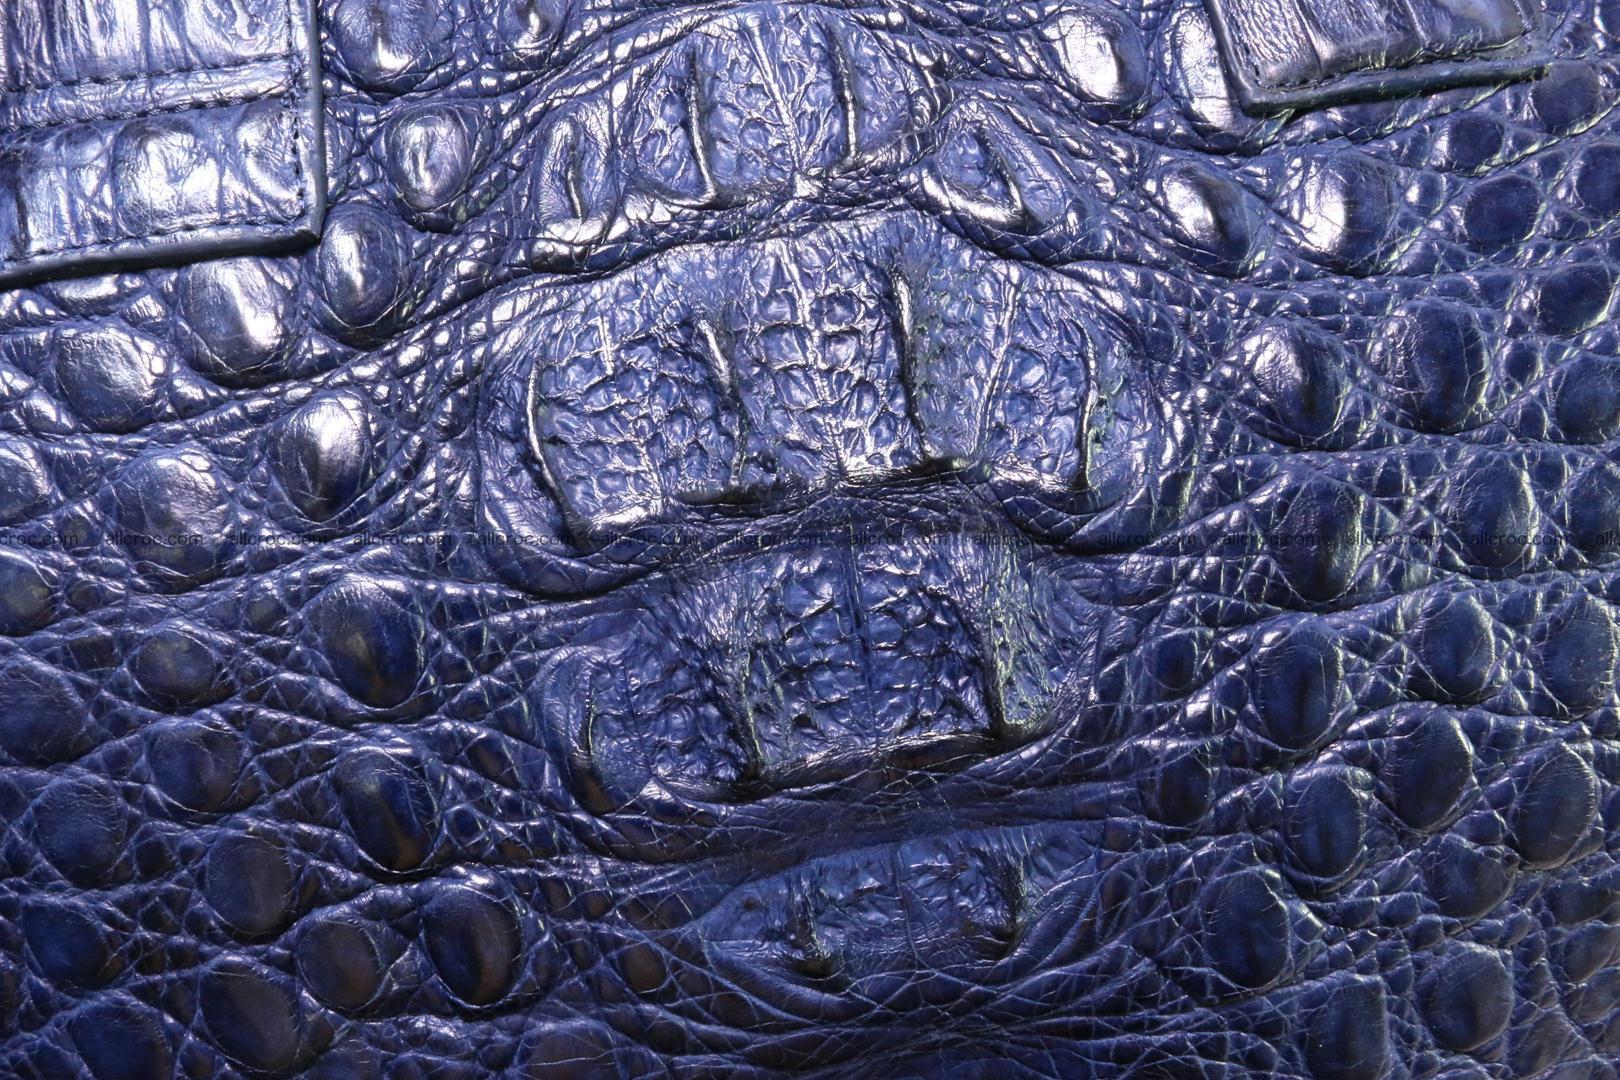 Crocodile skin handbag 423 Foto 9